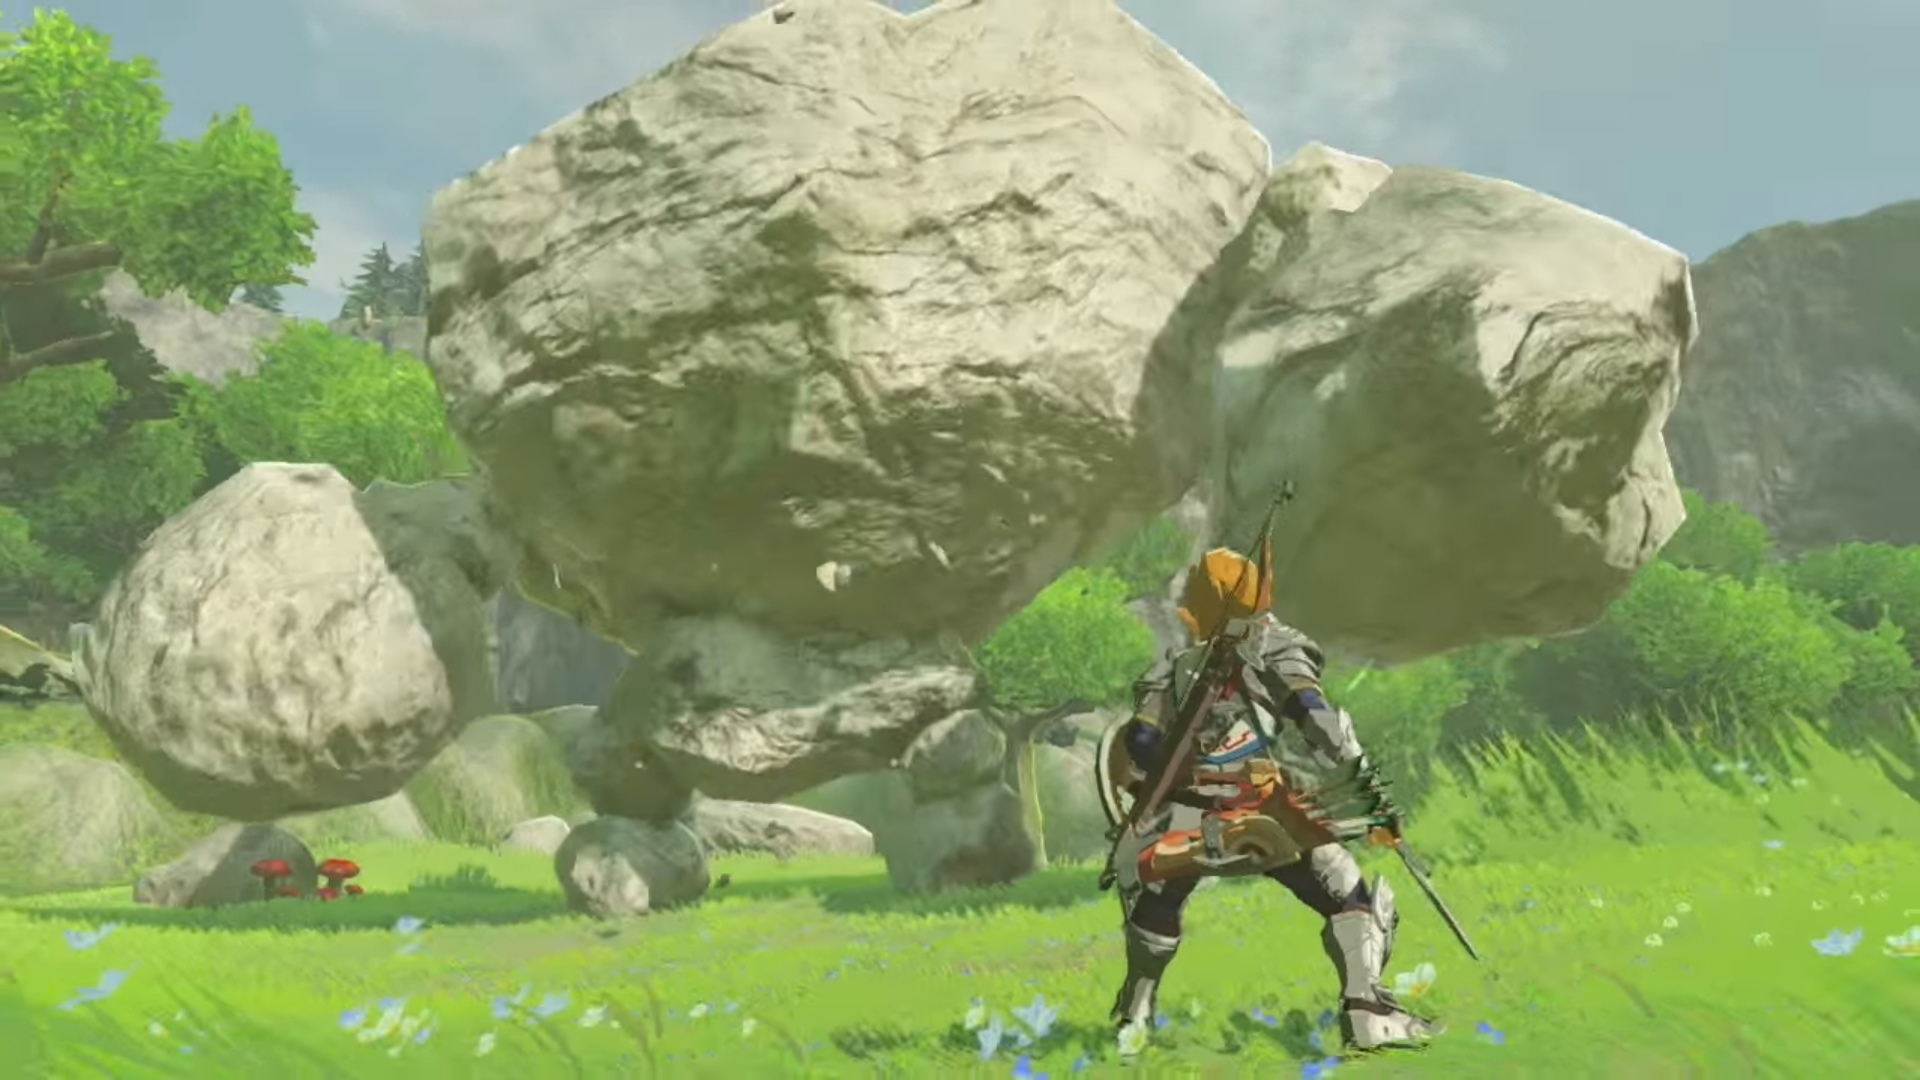 Breath Of The Wild Screensaver: The Legend Of Zelda: Breath Of The Wild